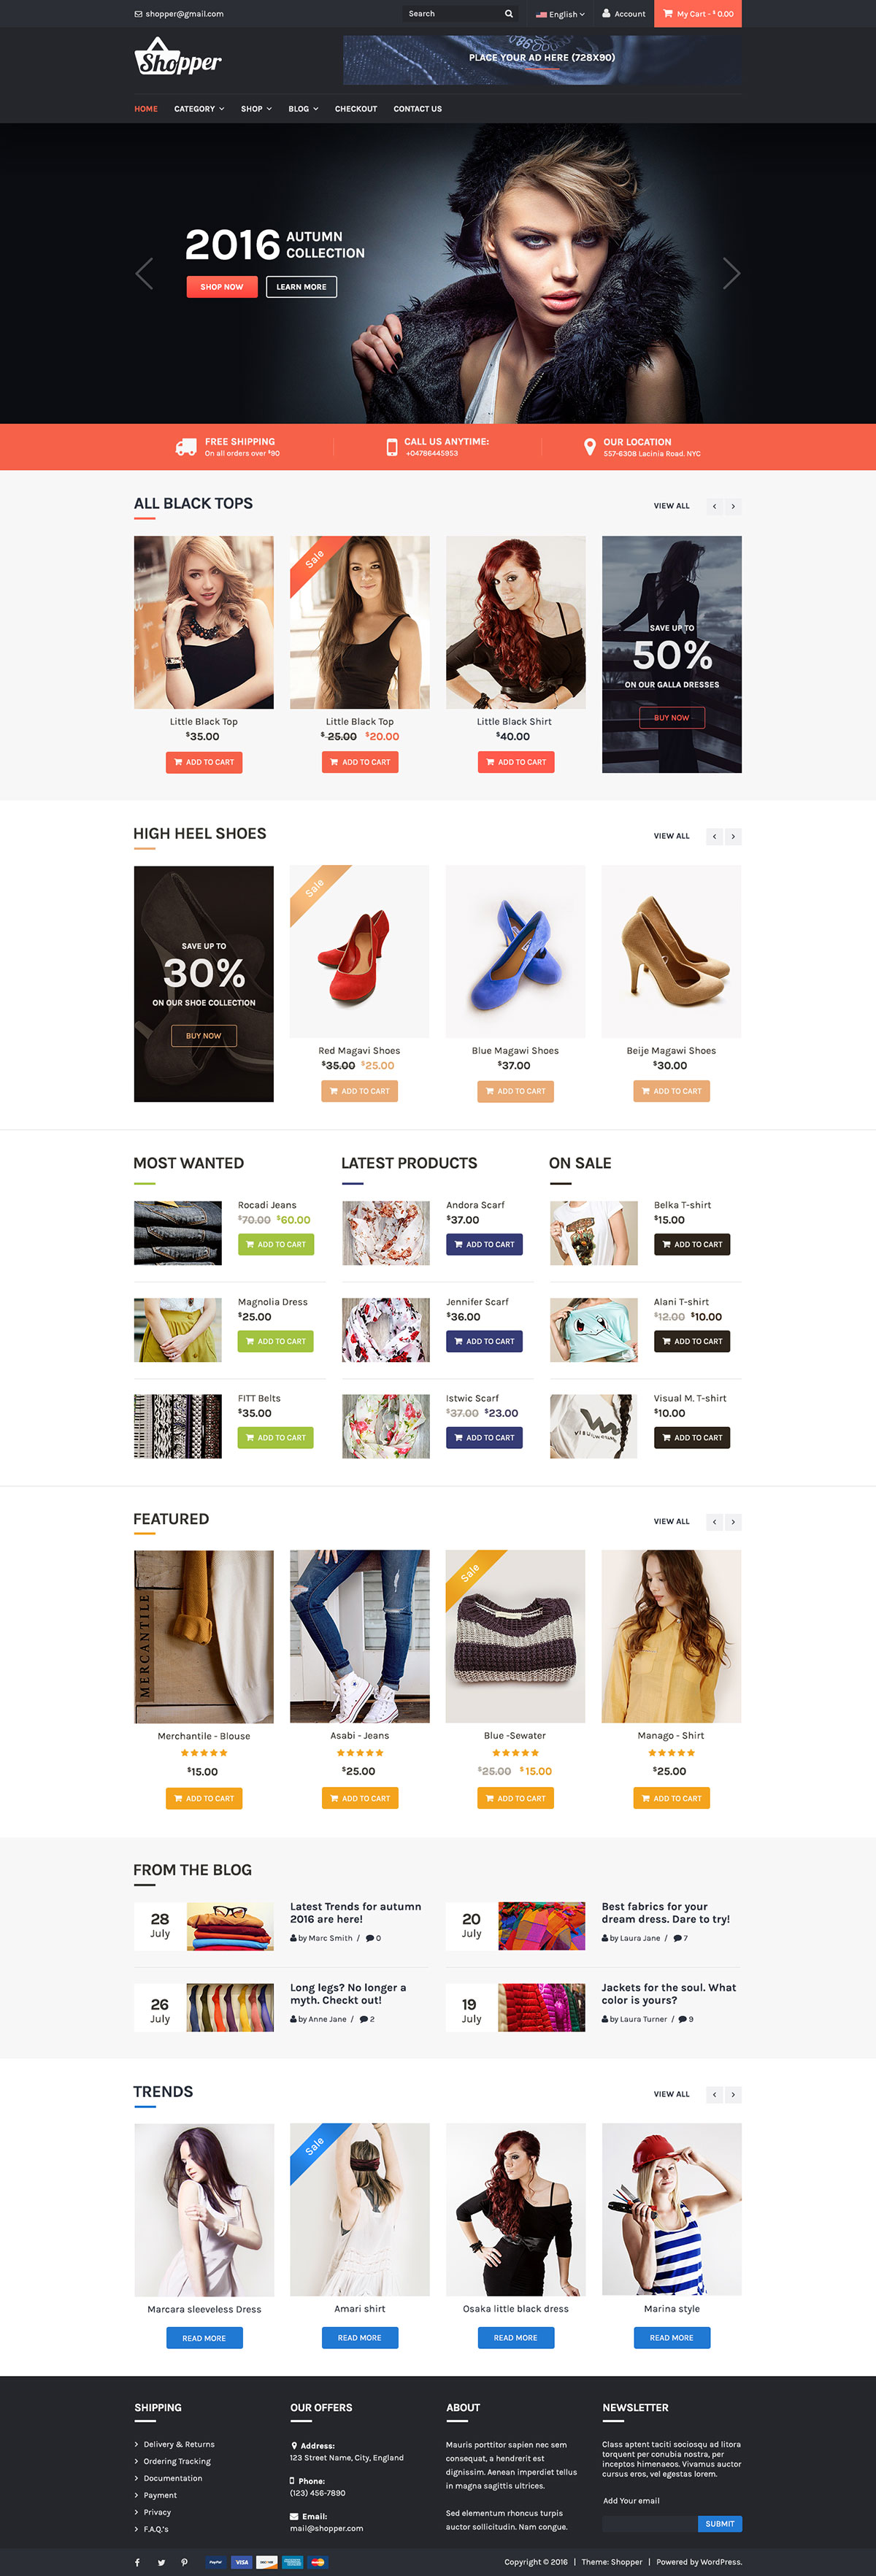 Tyche – Free eCommerce WordPress Theme